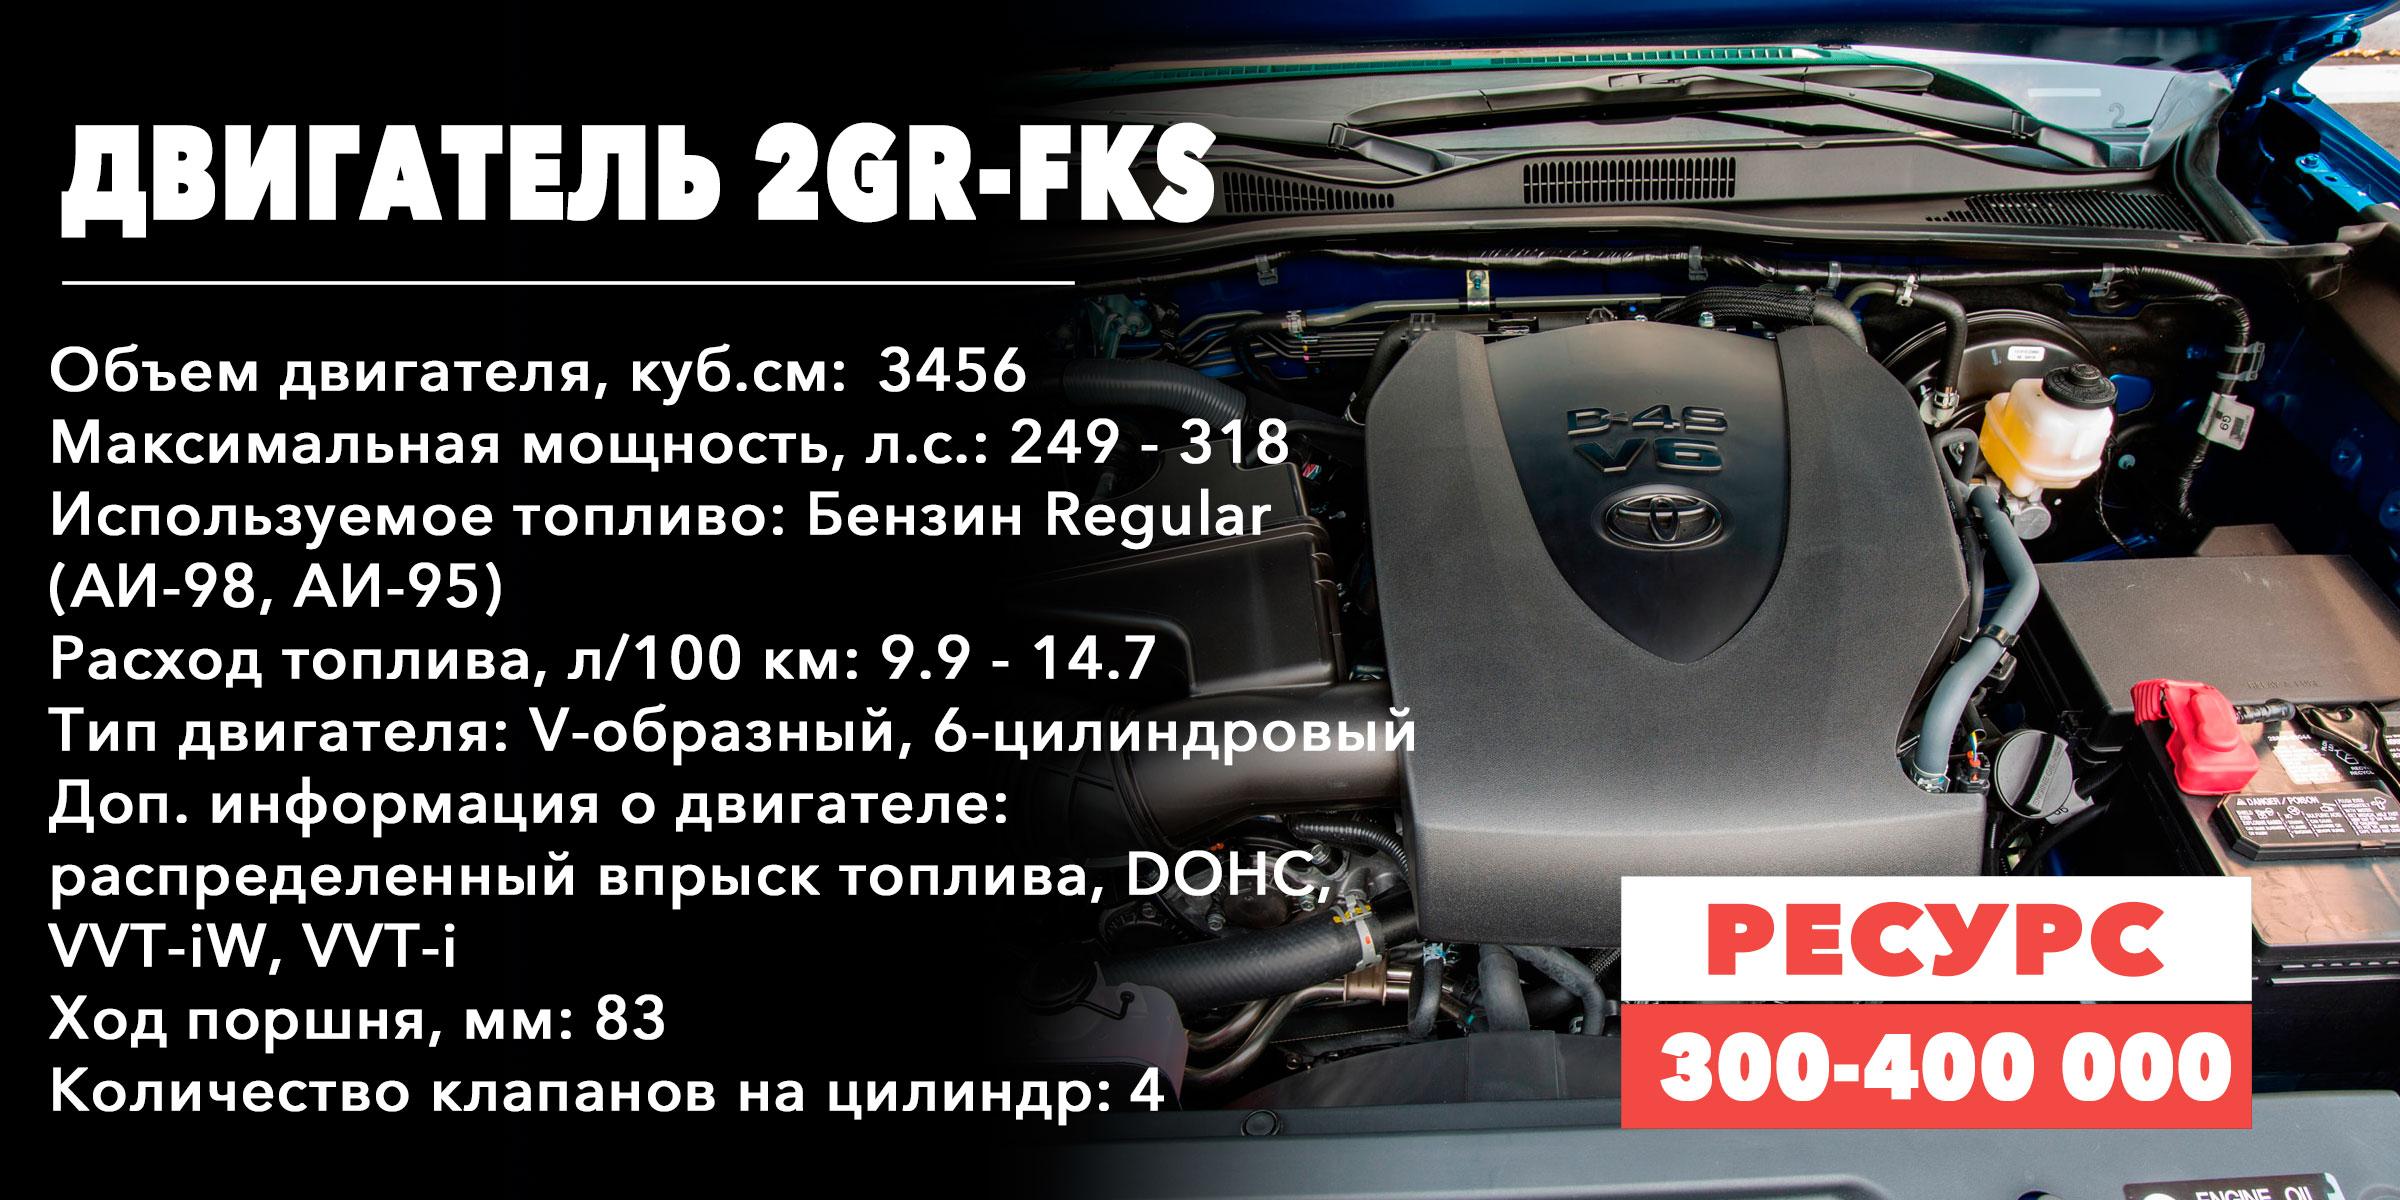 Ресурс установок семейства GR (2GR-FKS)